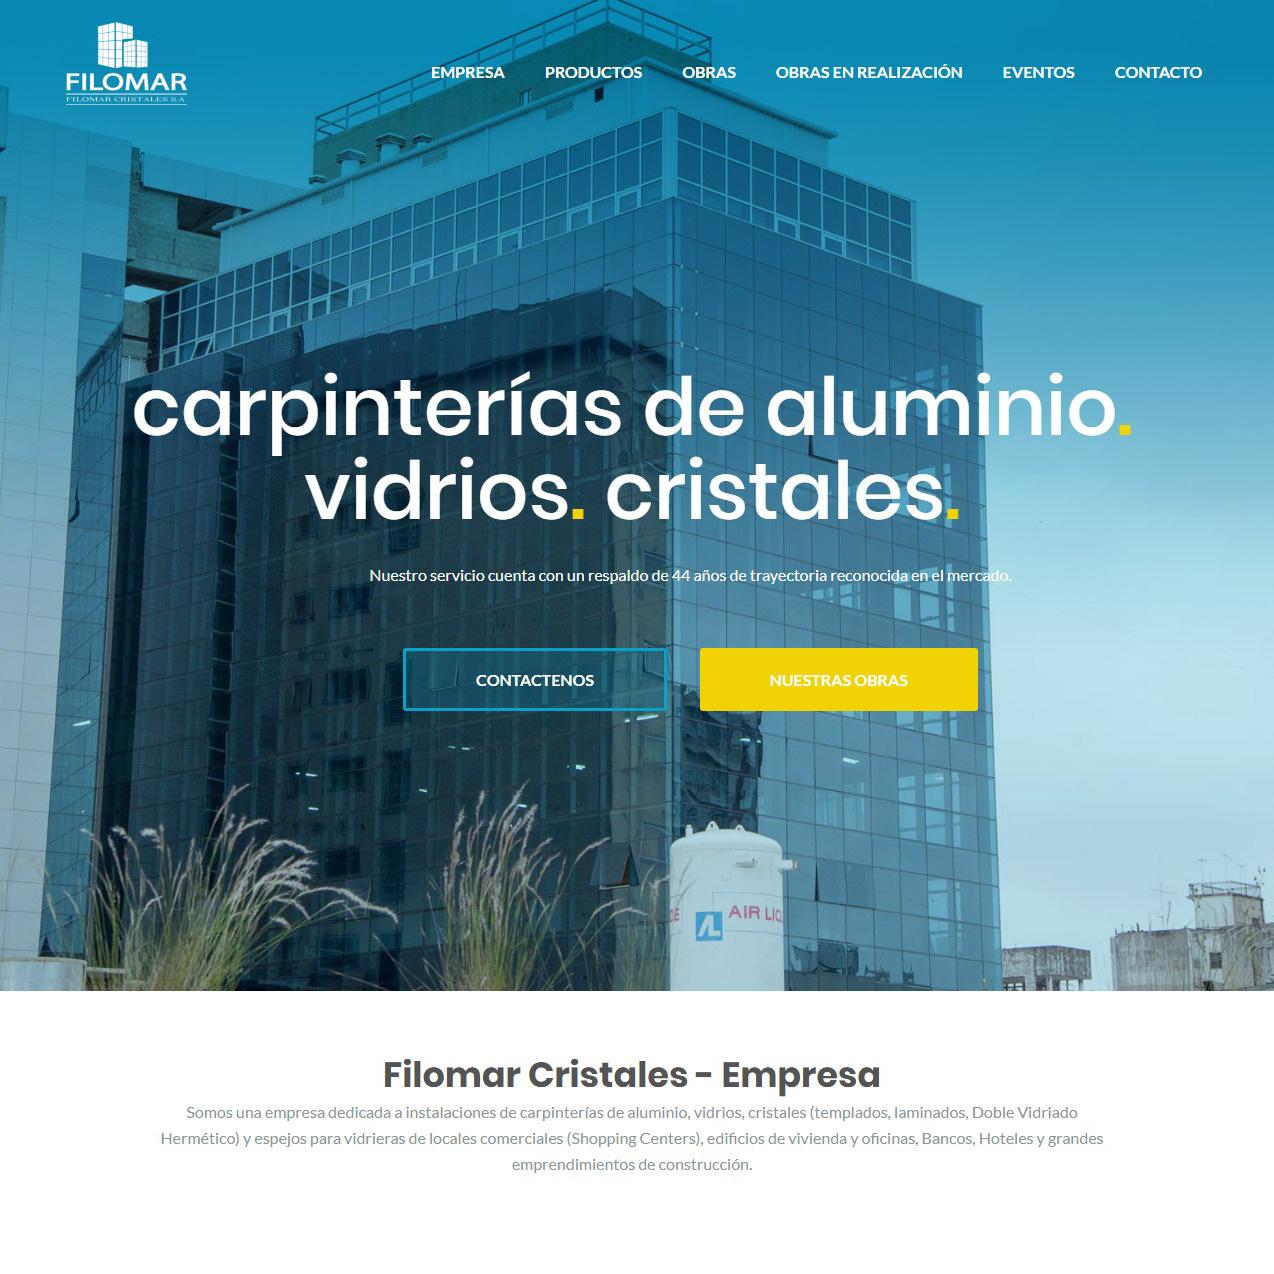 www.filomar.com.ar